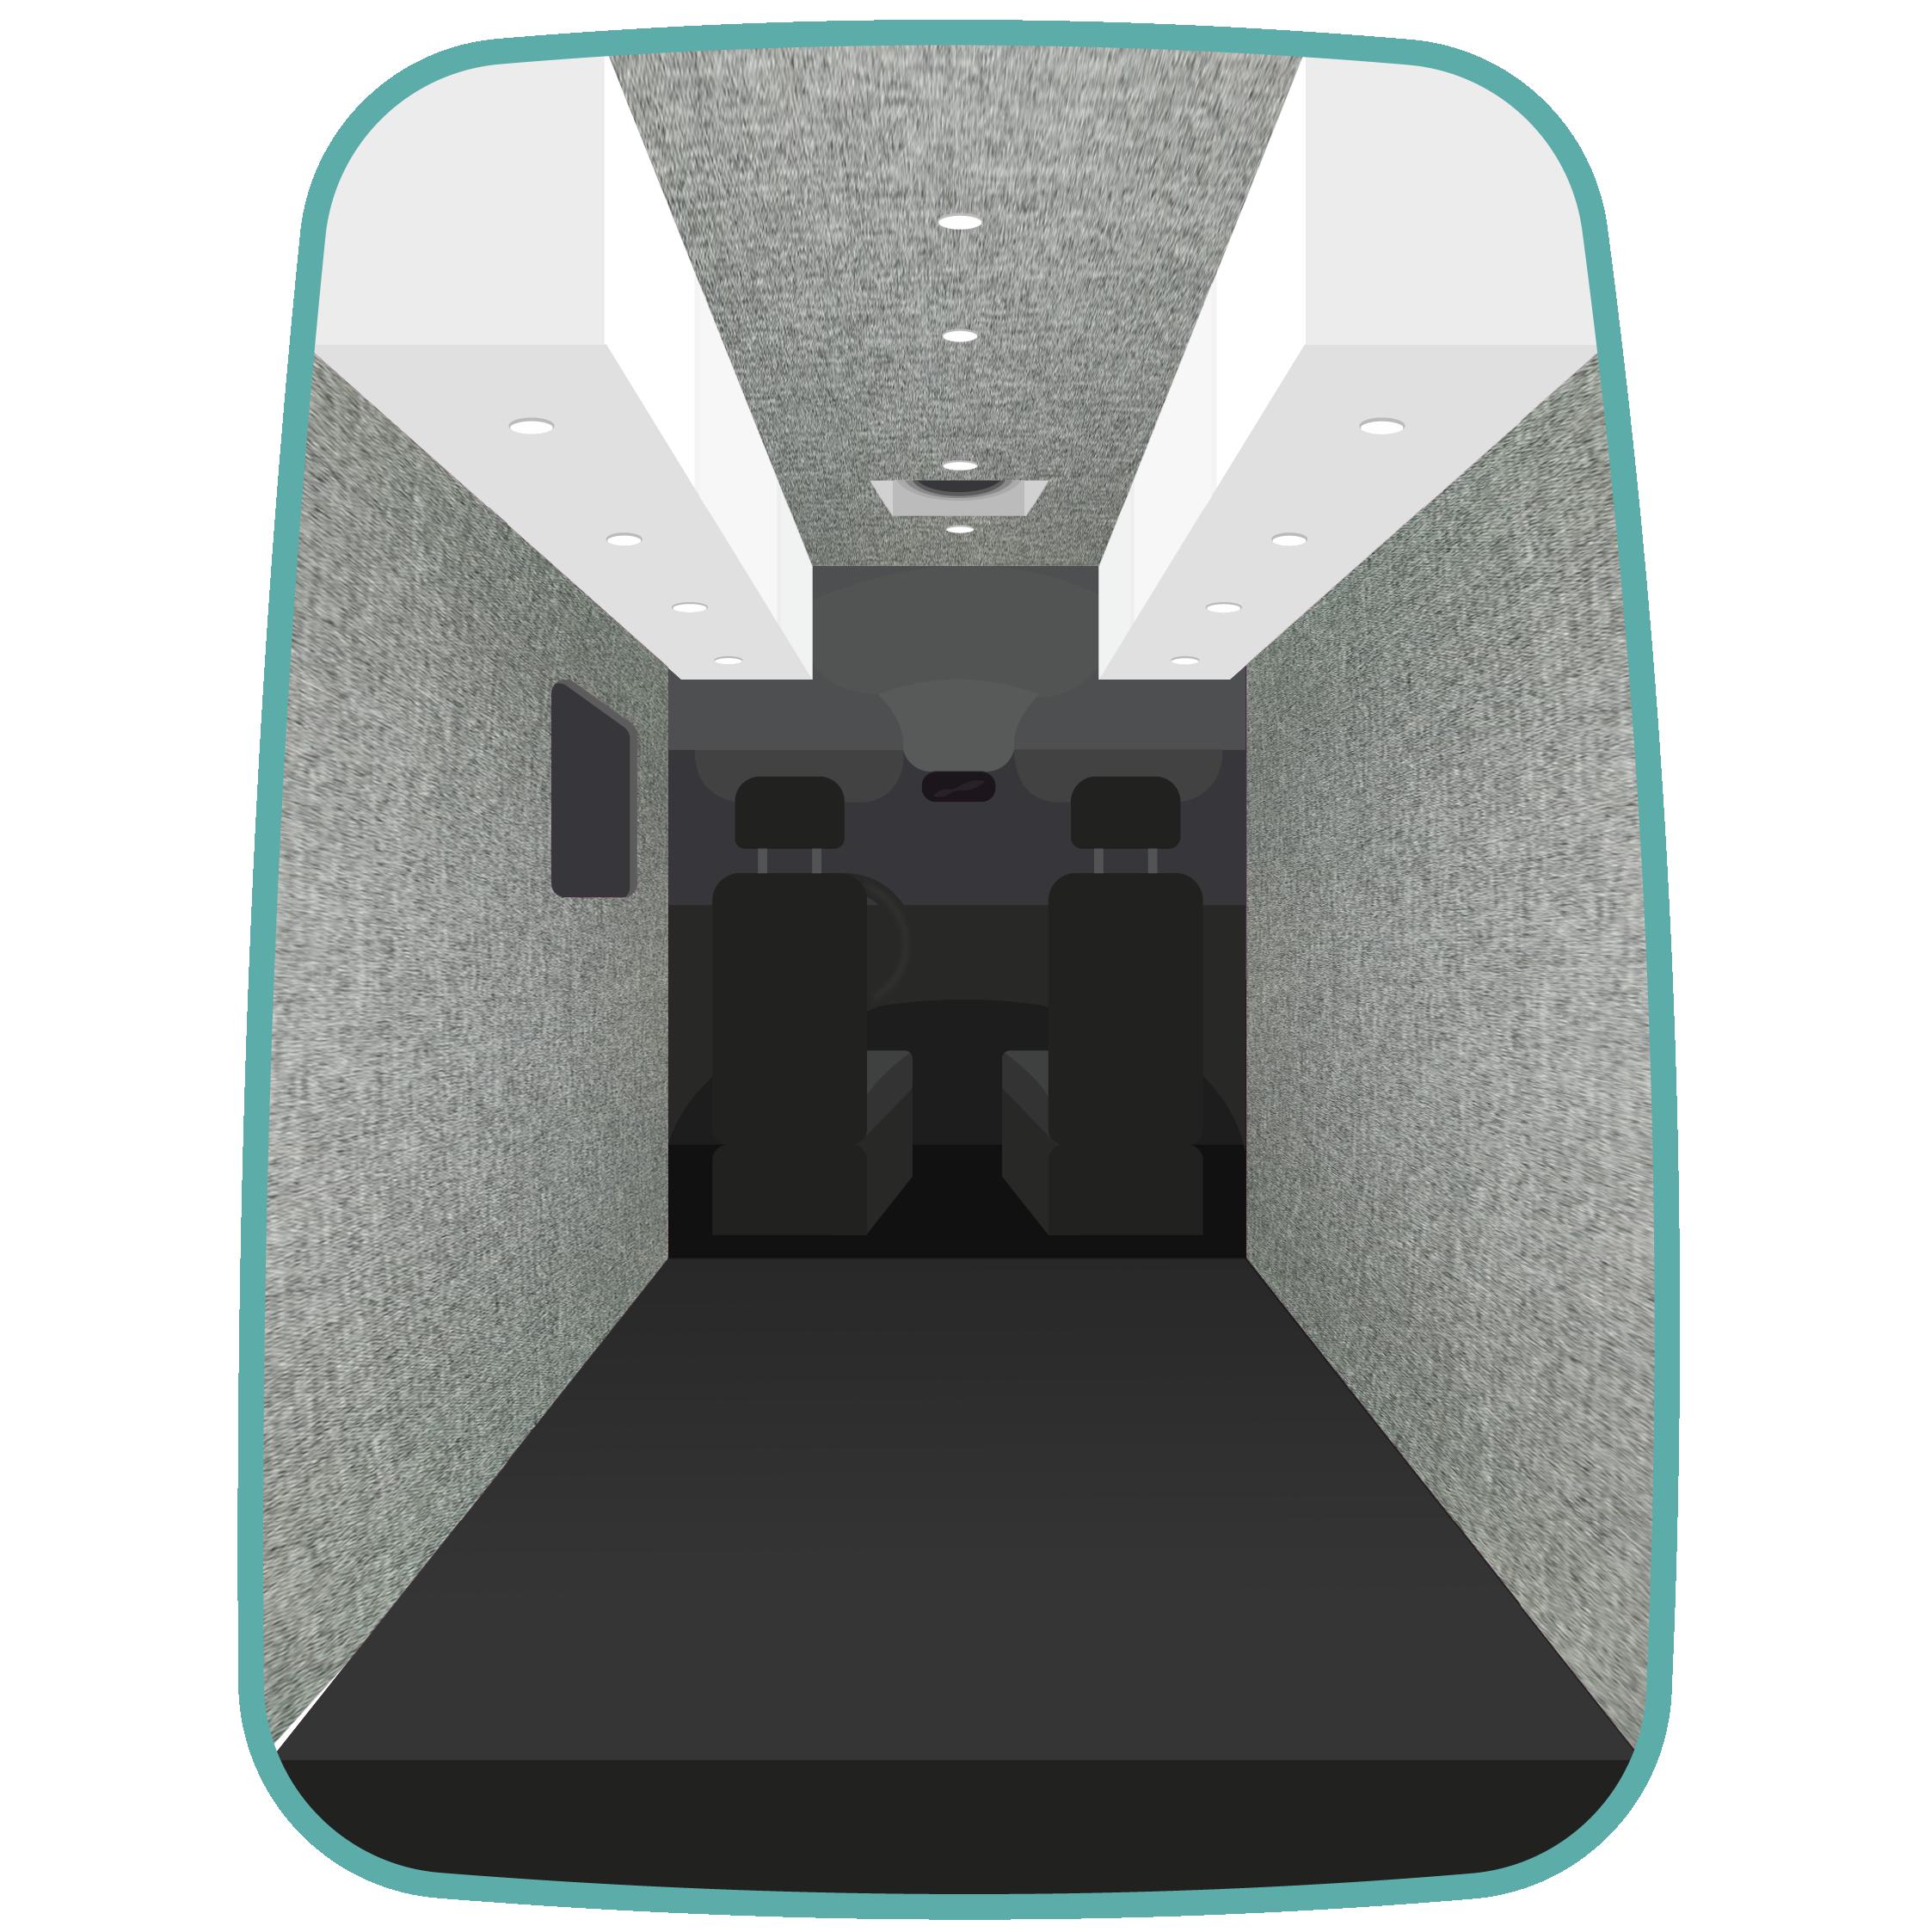 Vans Interiors_Fabric Fabric.png